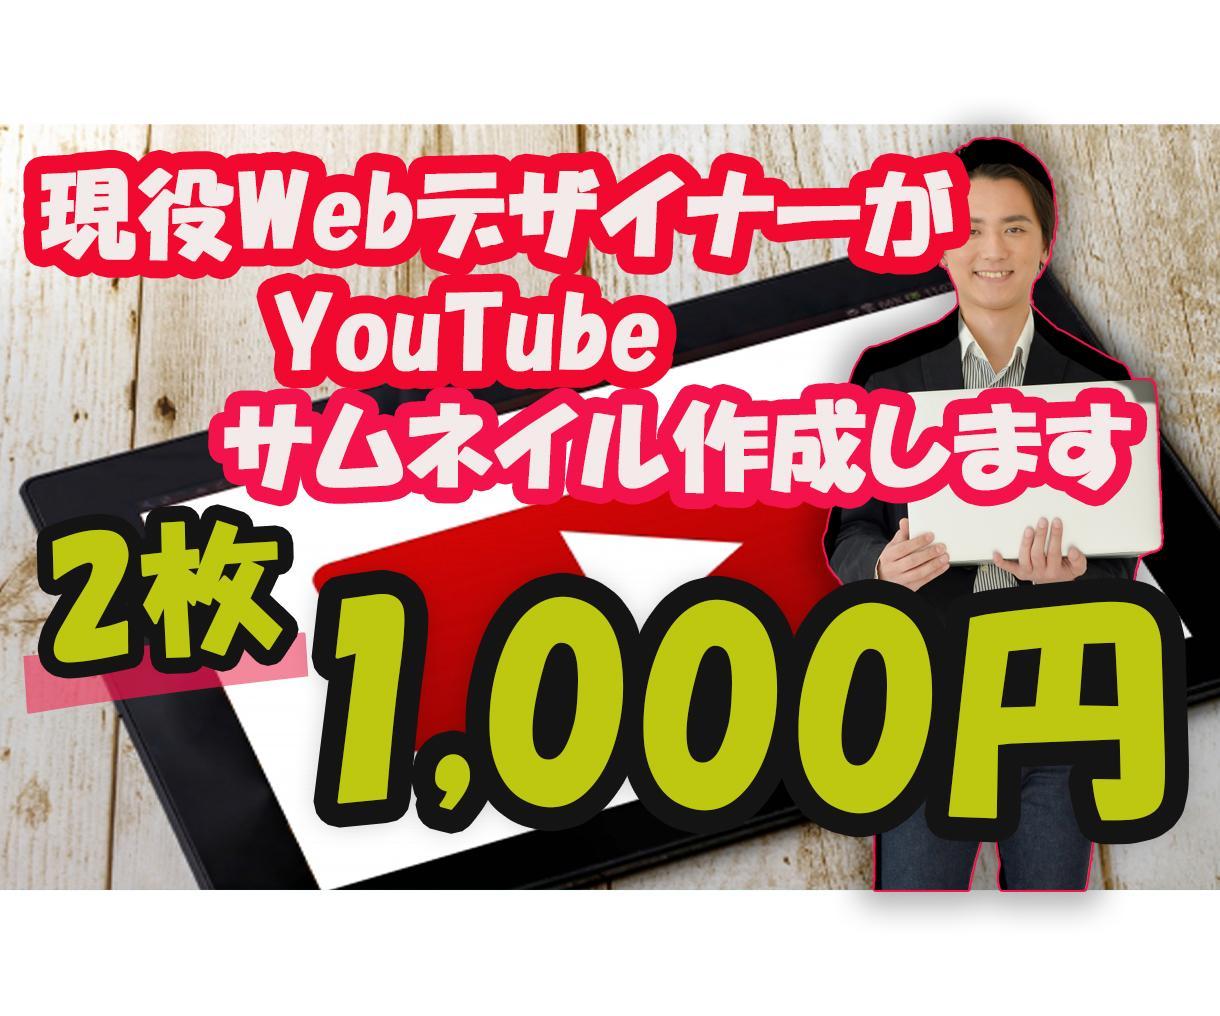 YouTubeサムネイル作成いたします 現役デザイナーが低価格、短納期で対応いたします。